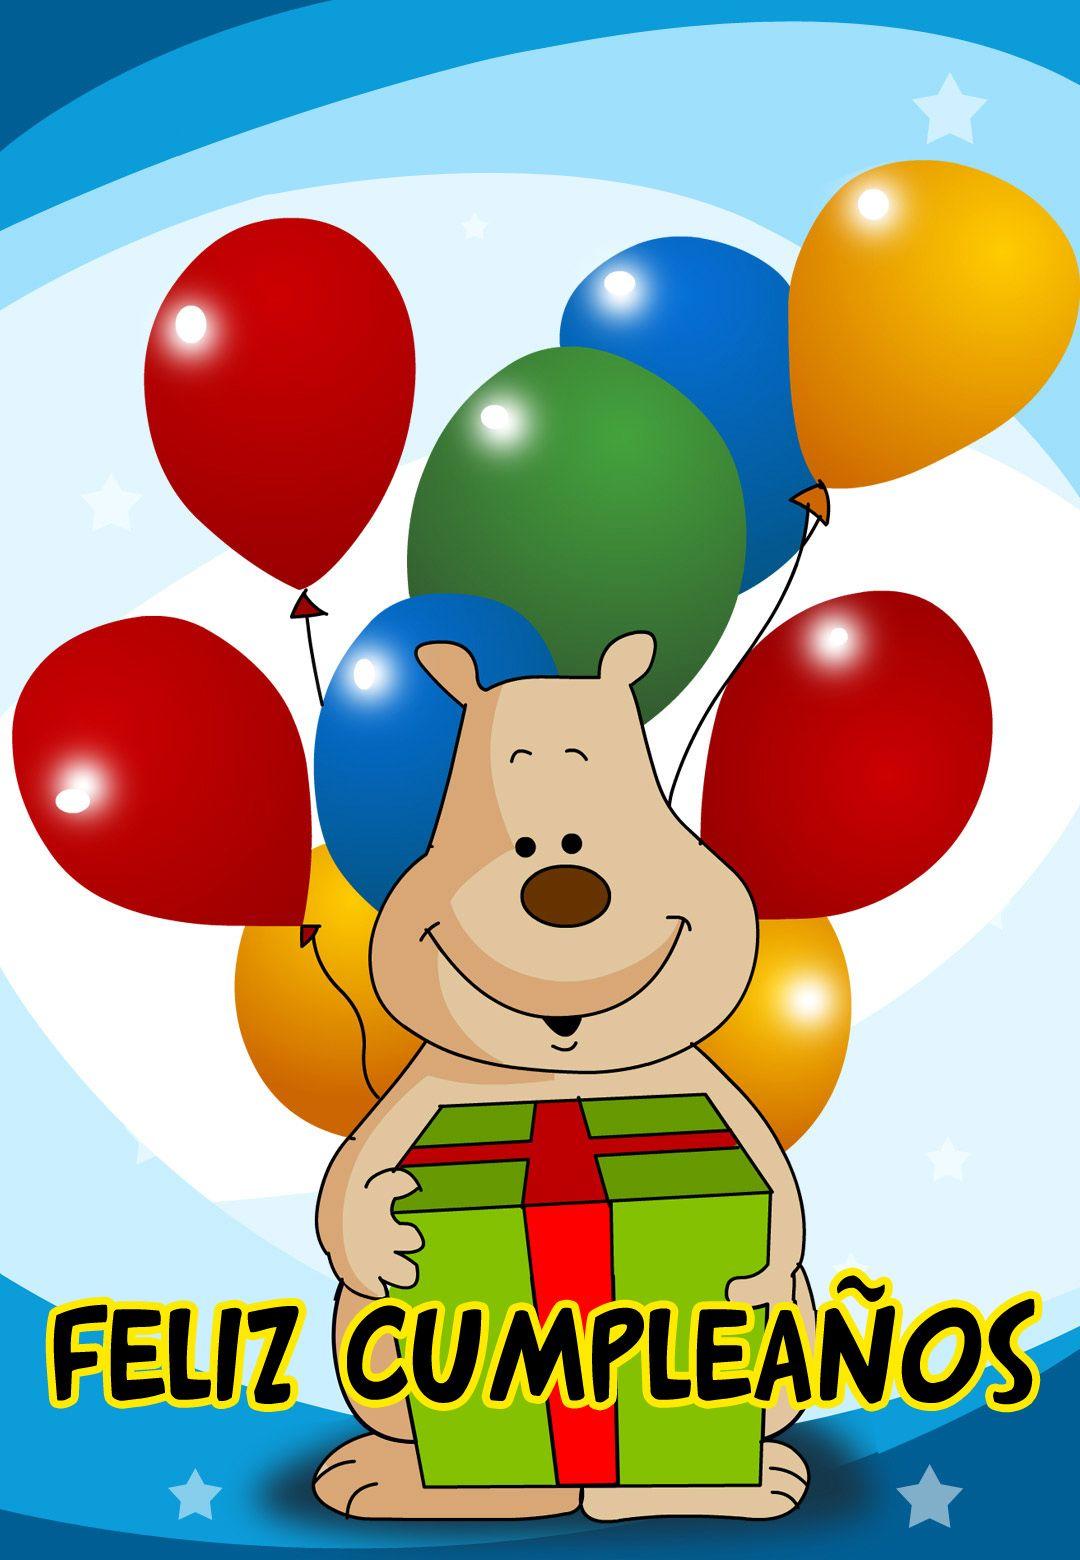 tarjetas de cumpleanos infantiles 1 feliz cumpleanos osito con globo